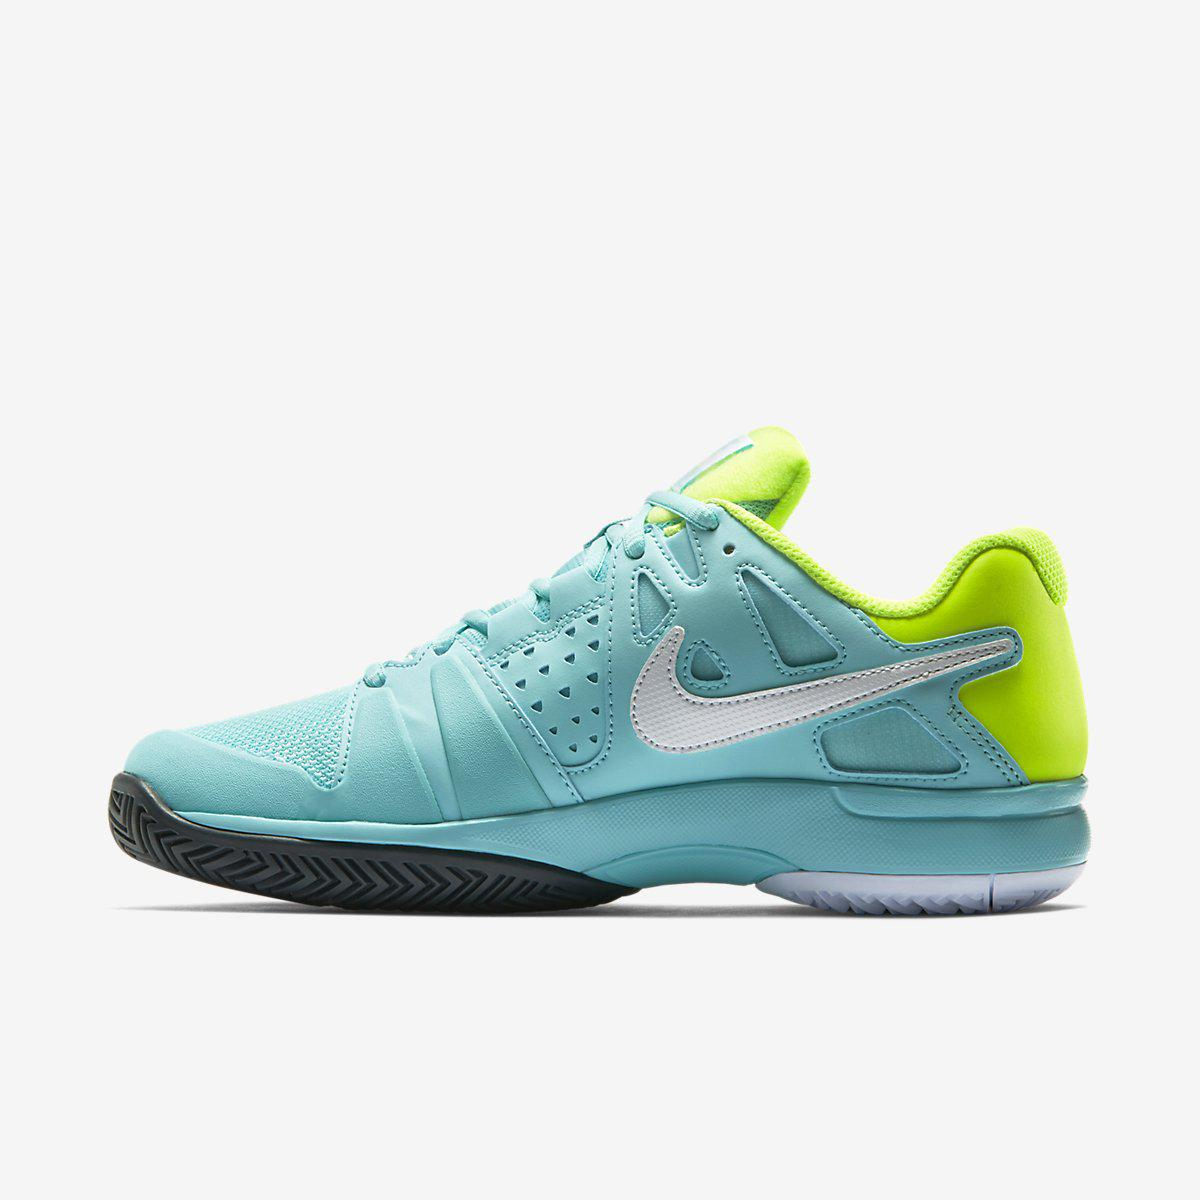 Womens Light Up Tennis Shoes